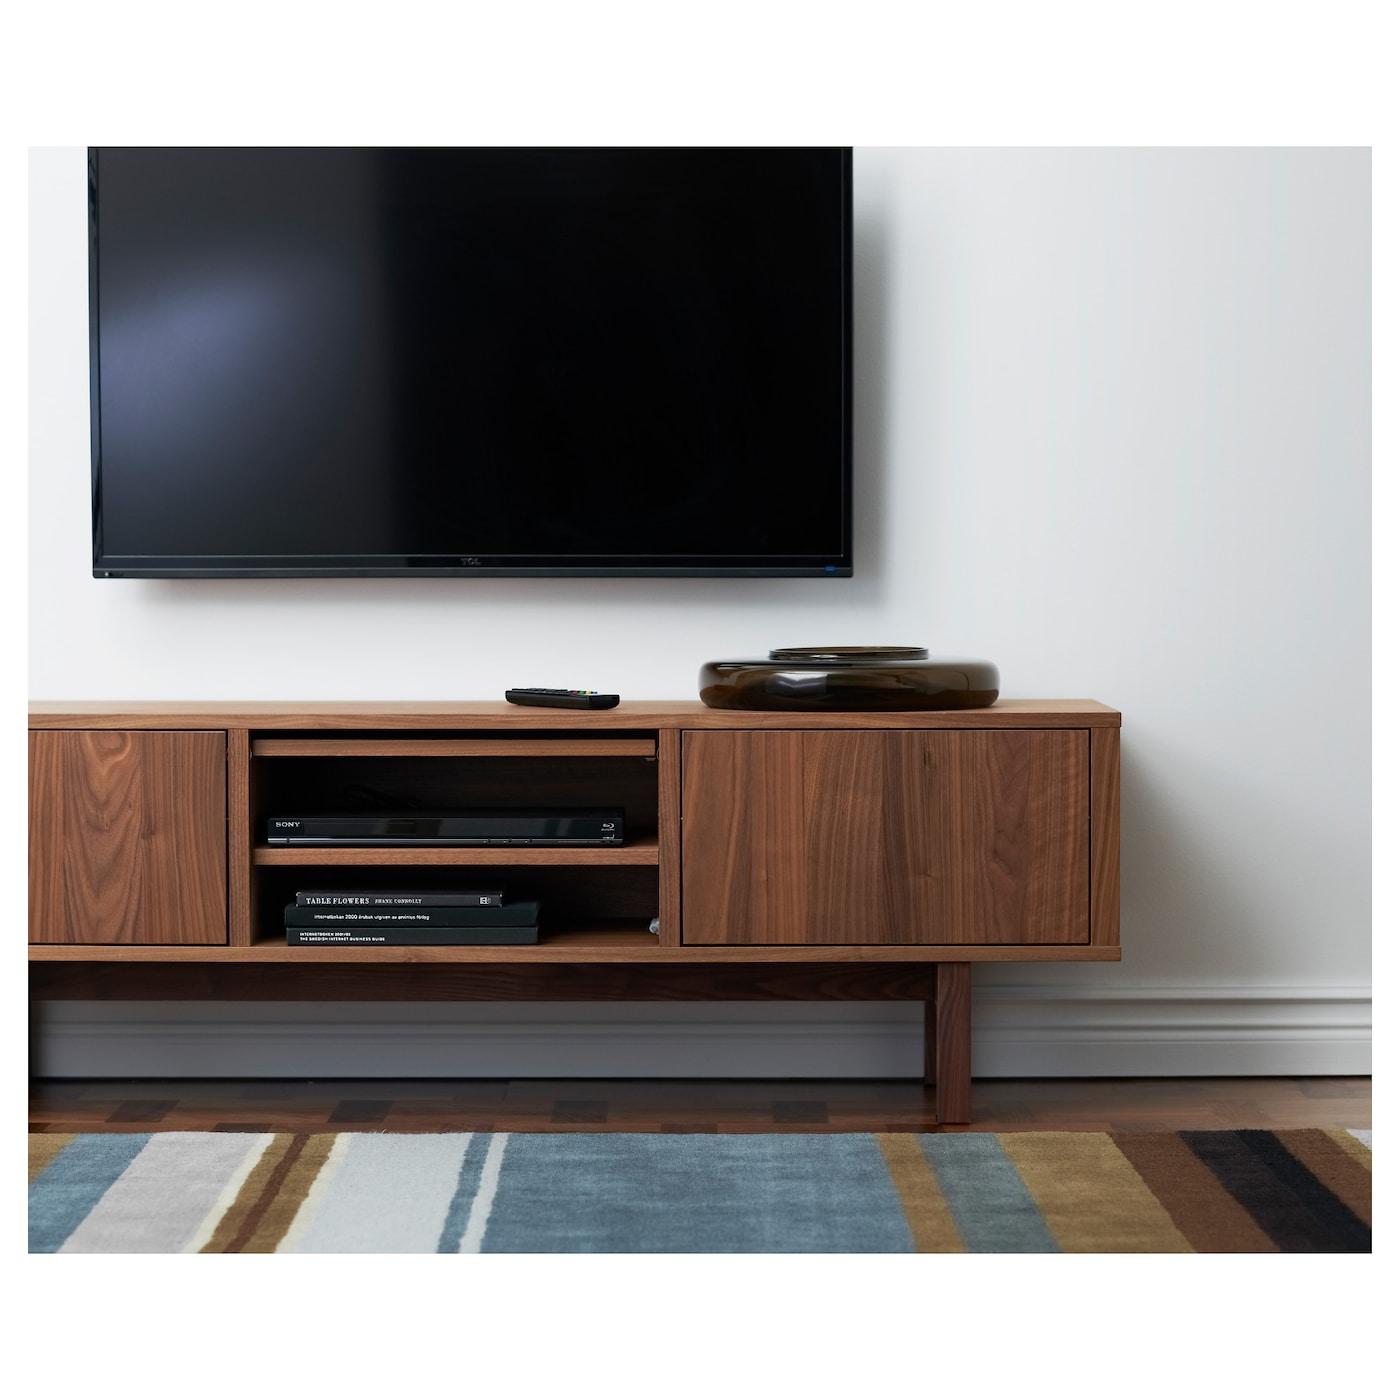 Stockholm mueble tv chapa nogal 160 x 40 x 50 cm ikea for Mueble tv ikea